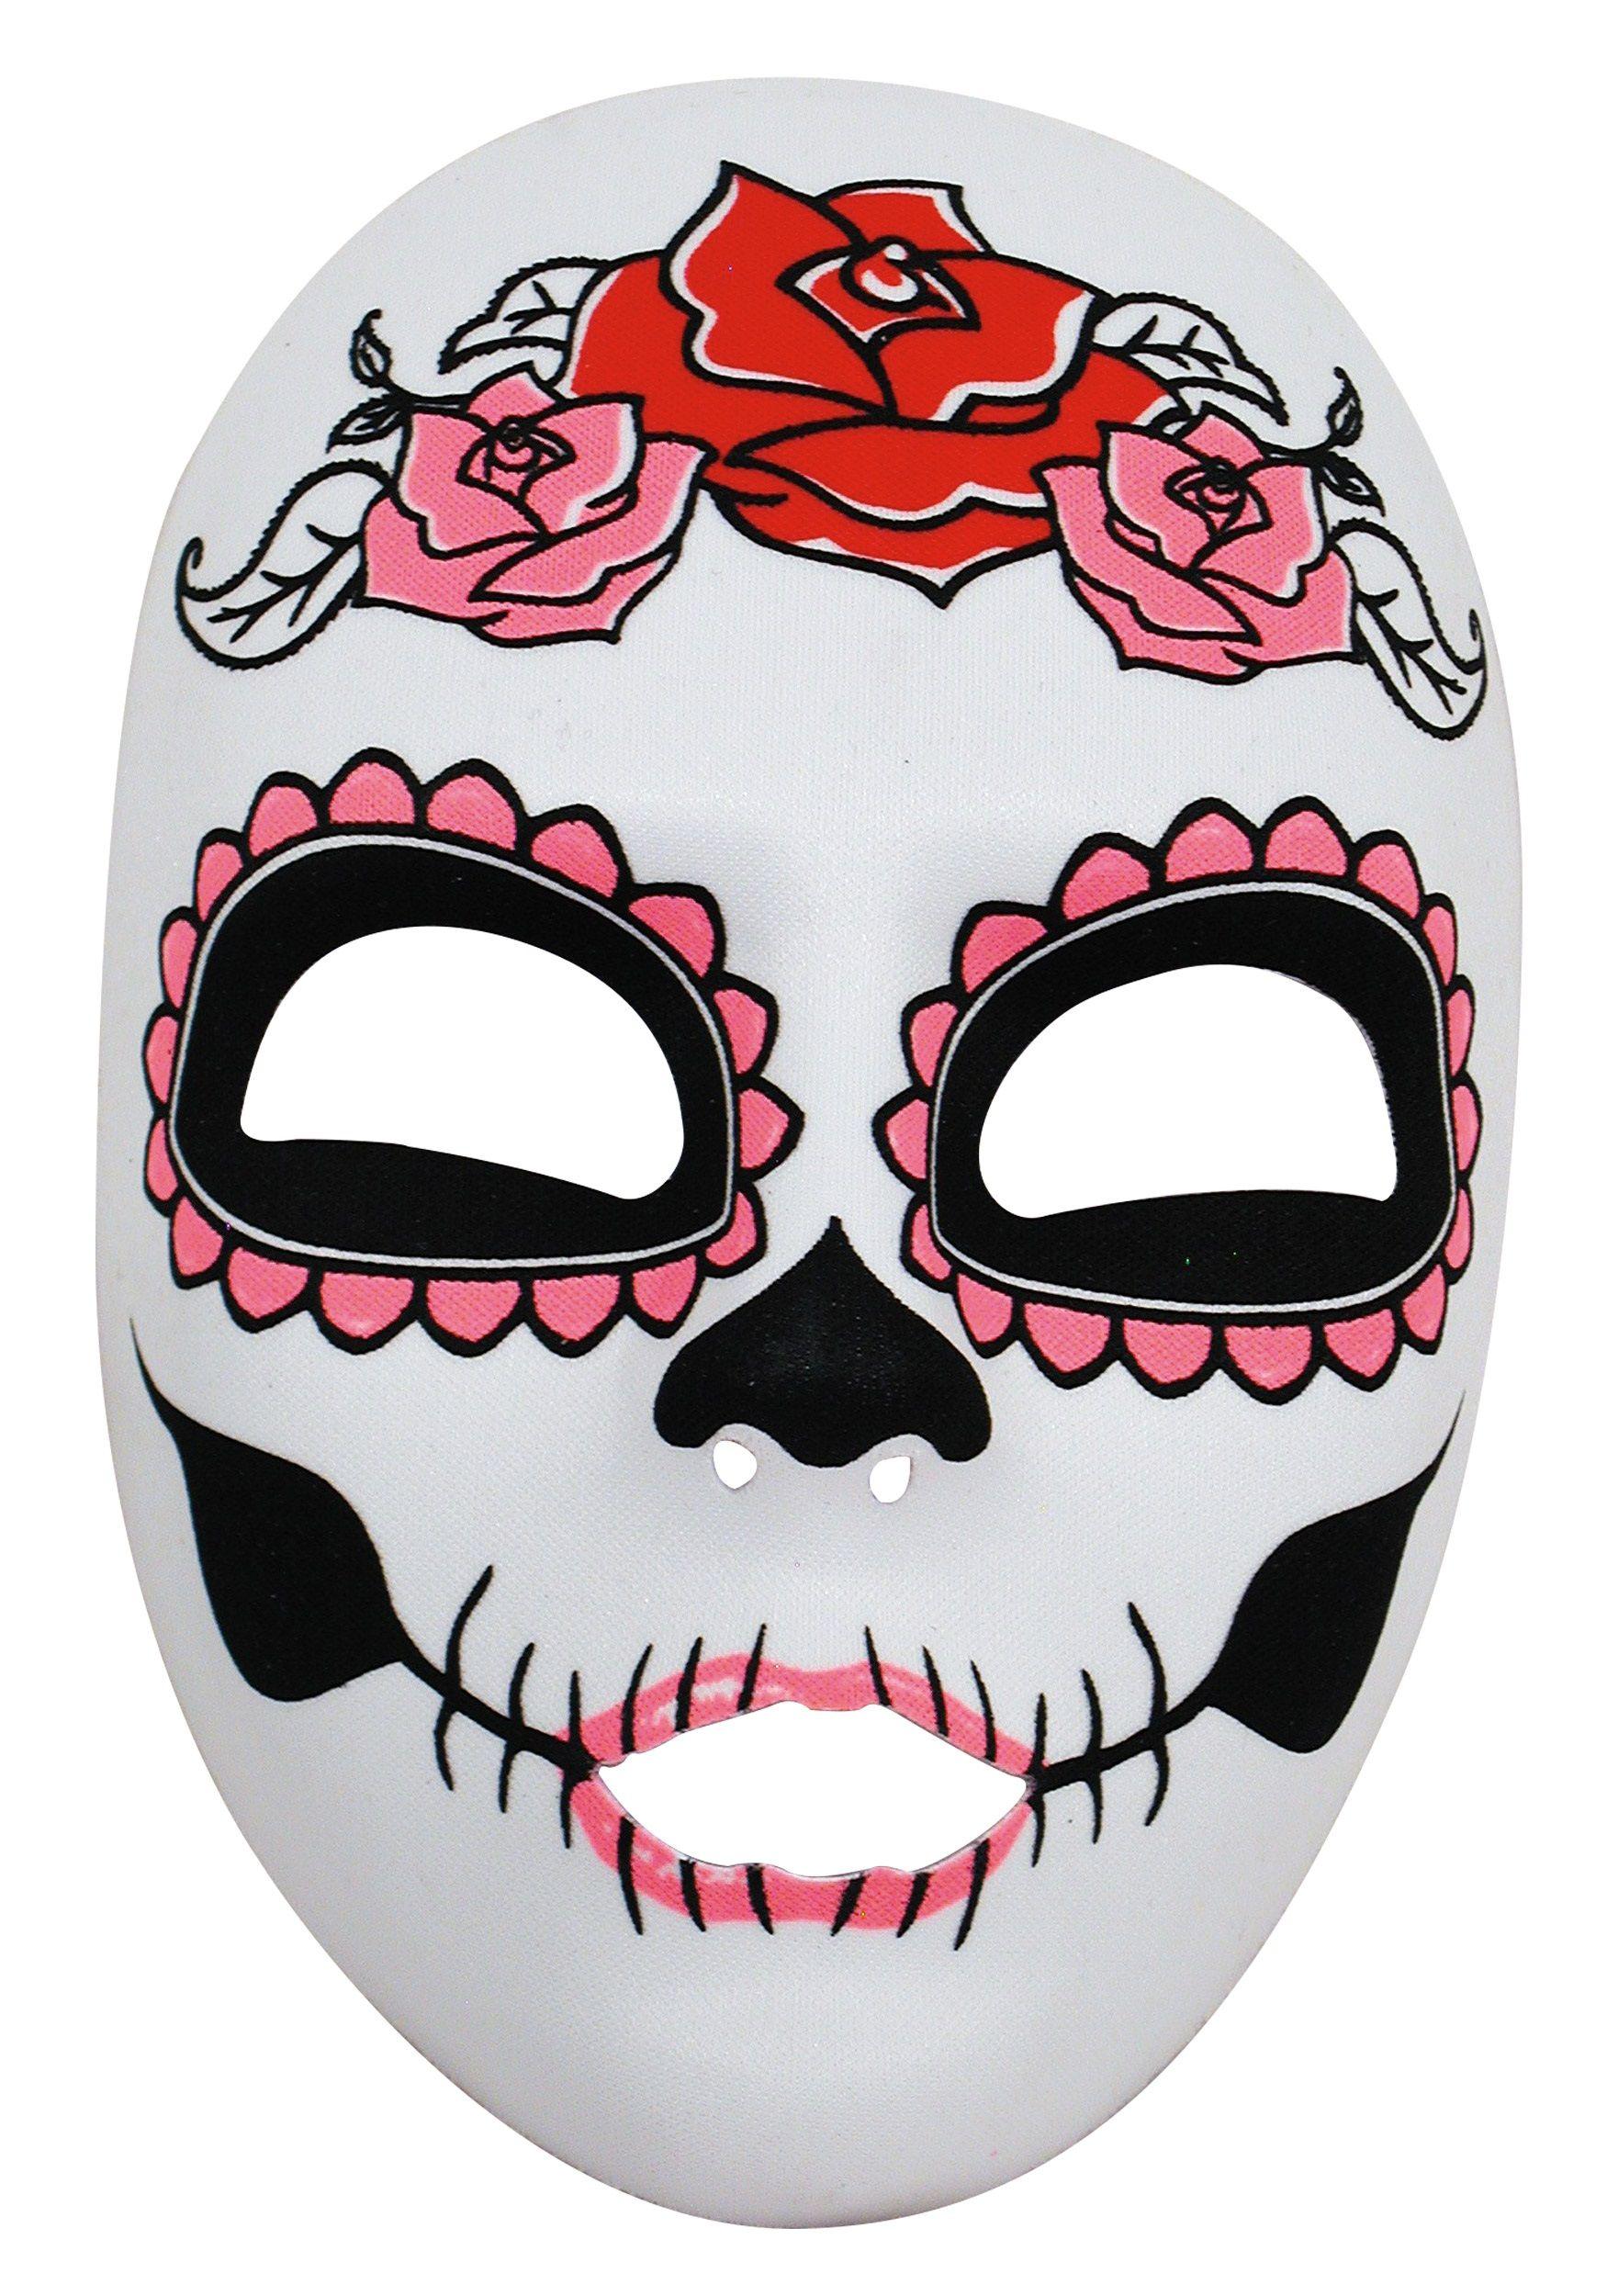 Mask Decoration Ideas New Výsledek Obrázku Pro Sugar Skull  La Muerte  Pinterest  Masking Decorating Design